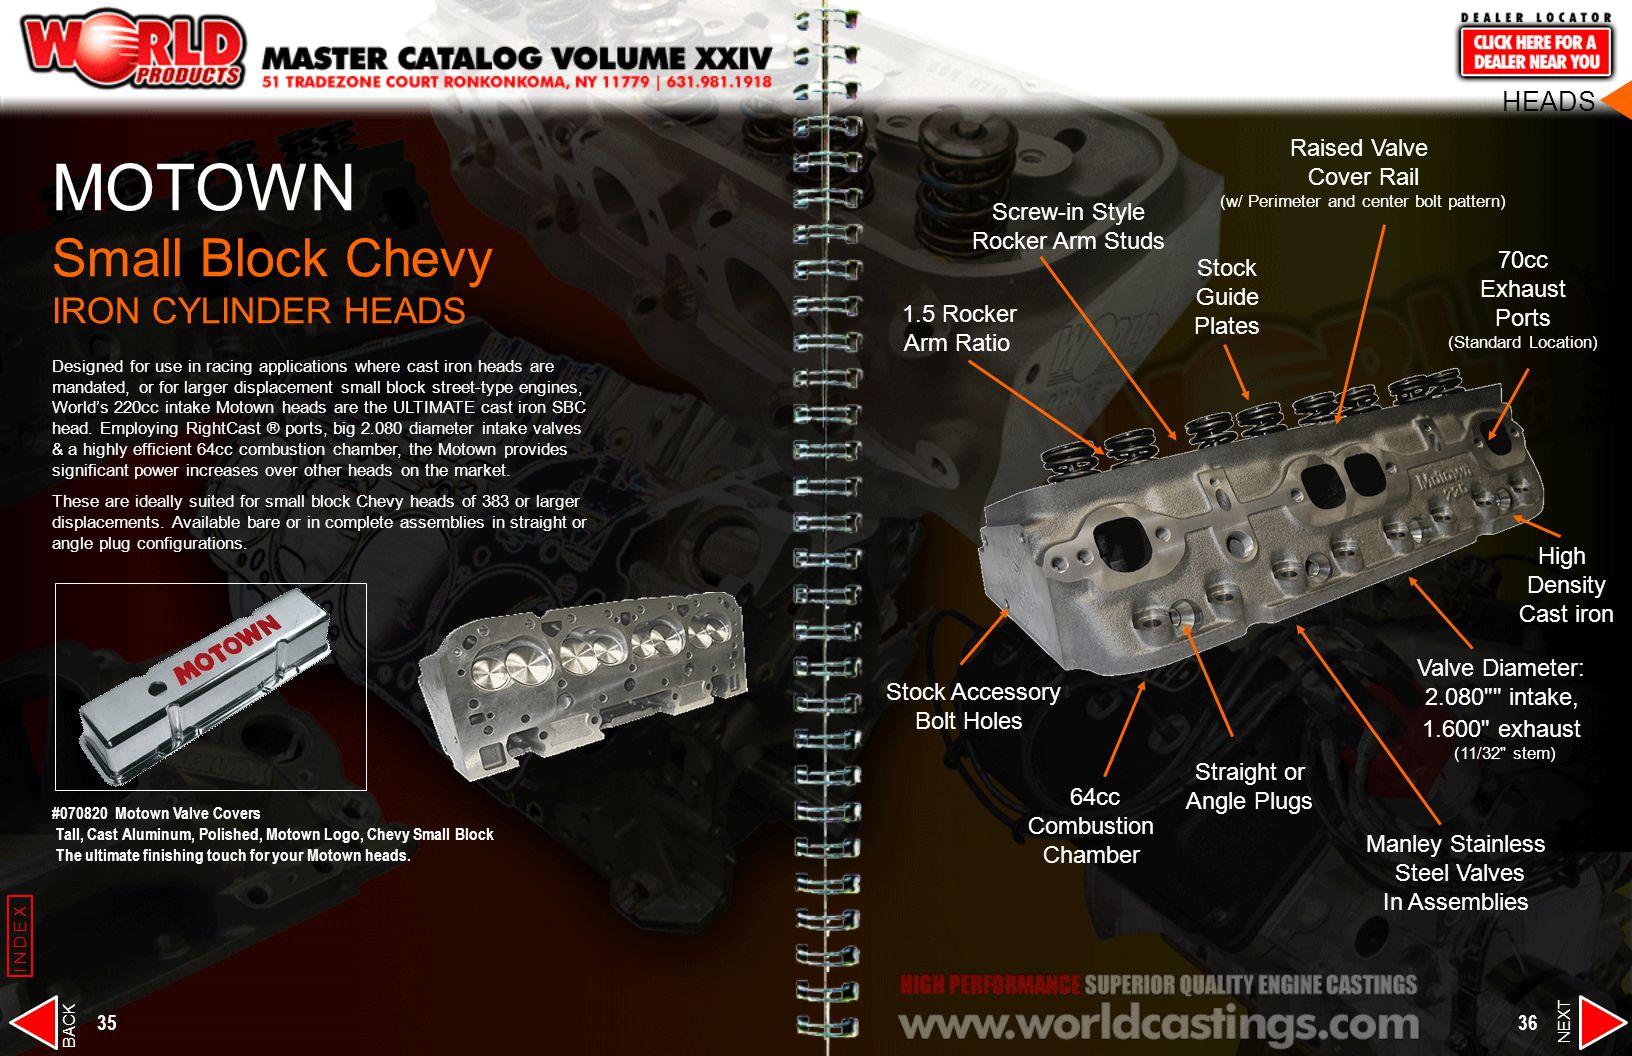 MOTOWN Small Block Chevy IRON CYLINDER HEADS HEADS Raised Valve